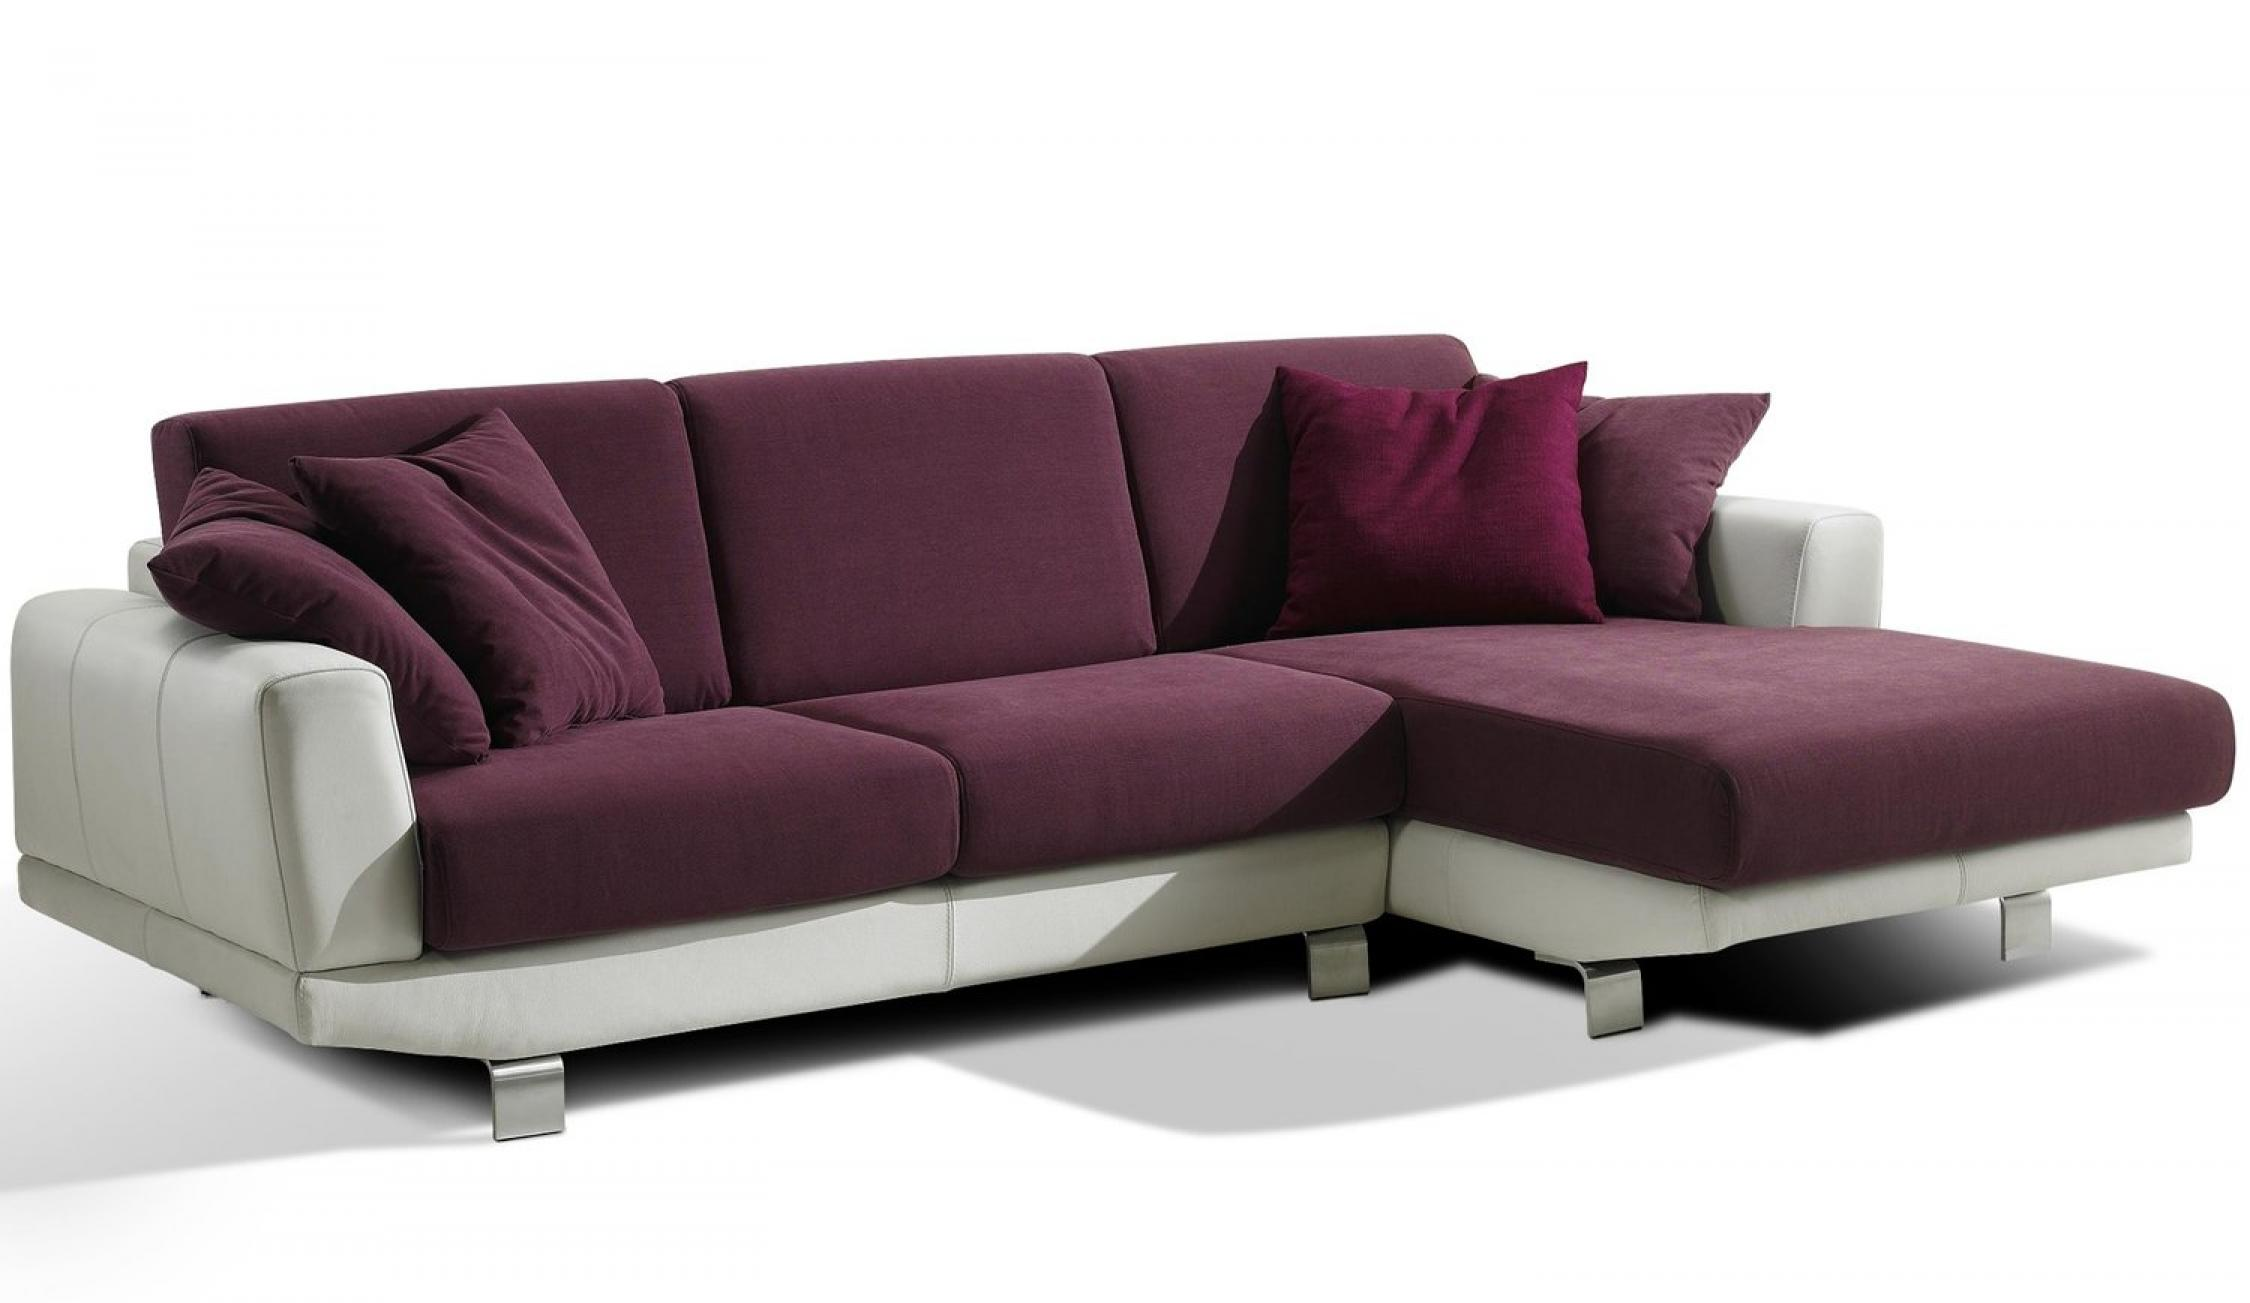 canapes pas cher design maison design. Black Bedroom Furniture Sets. Home Design Ideas